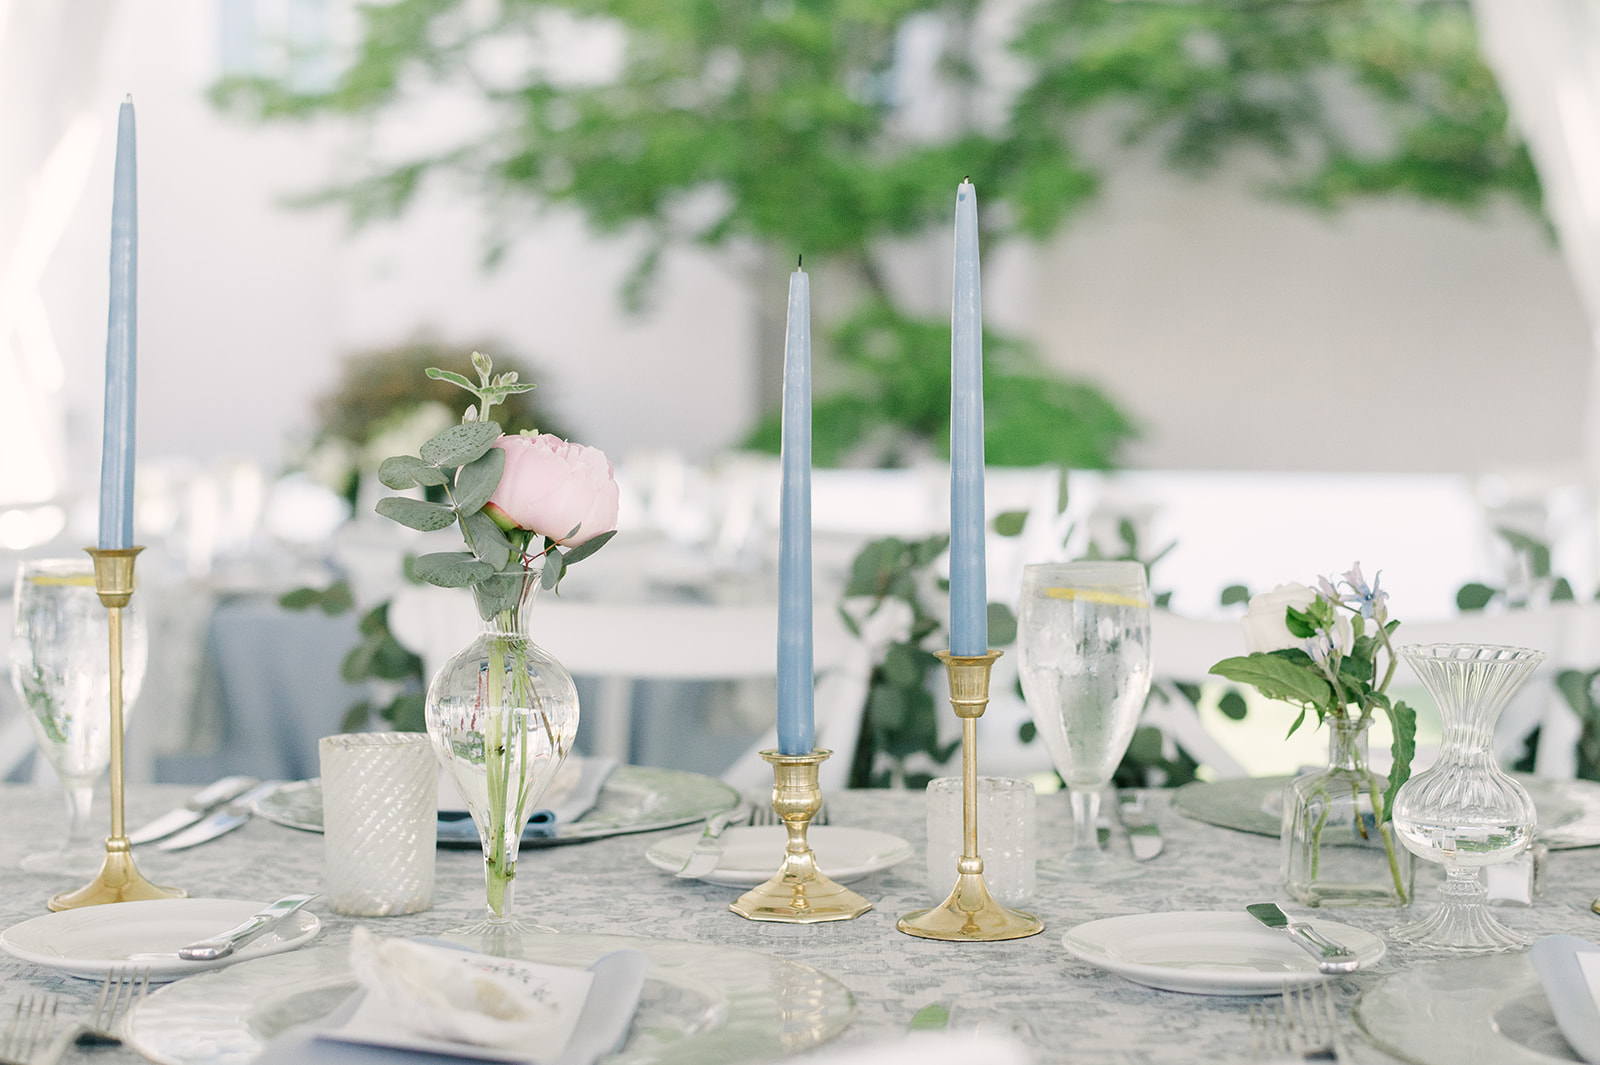 reception-boland-sarah-street-photography-53.jpgCourtney Inghram Cavalier Virginia Beach Wedding Florist Southern and Coastal Wedding